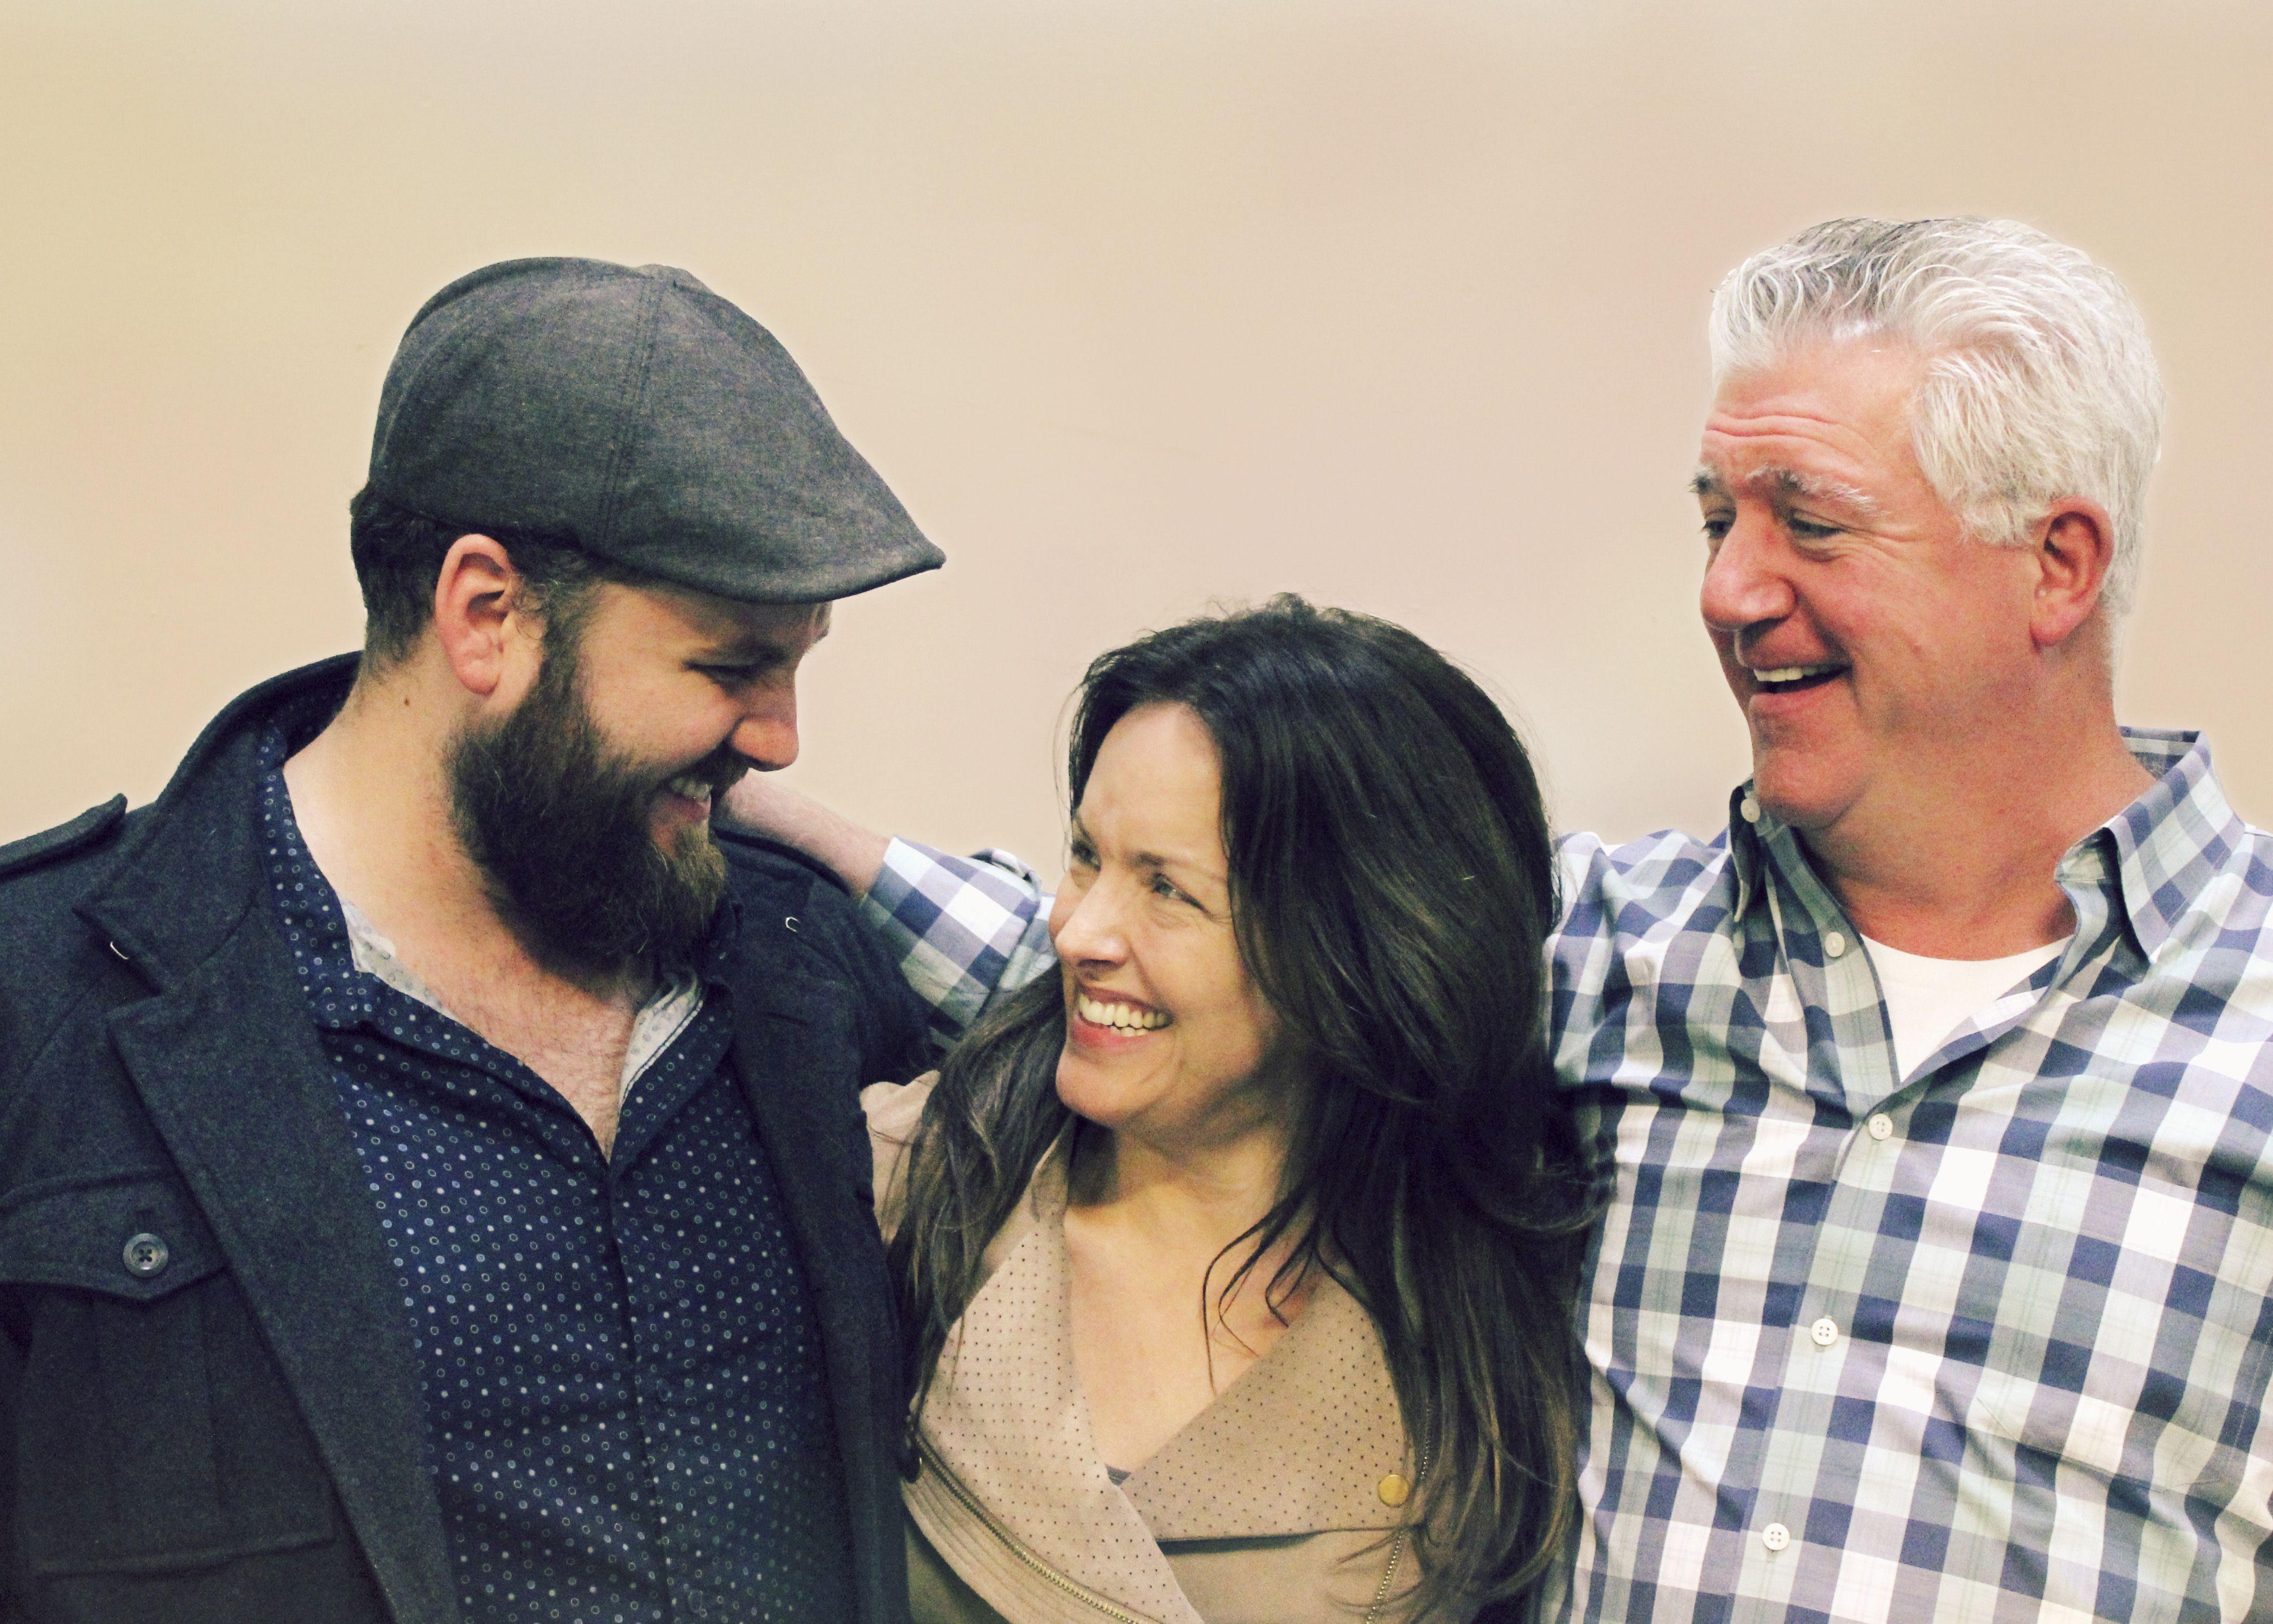 Kurt Norby, Alice Ripley and Greg Jbara star in Season 39